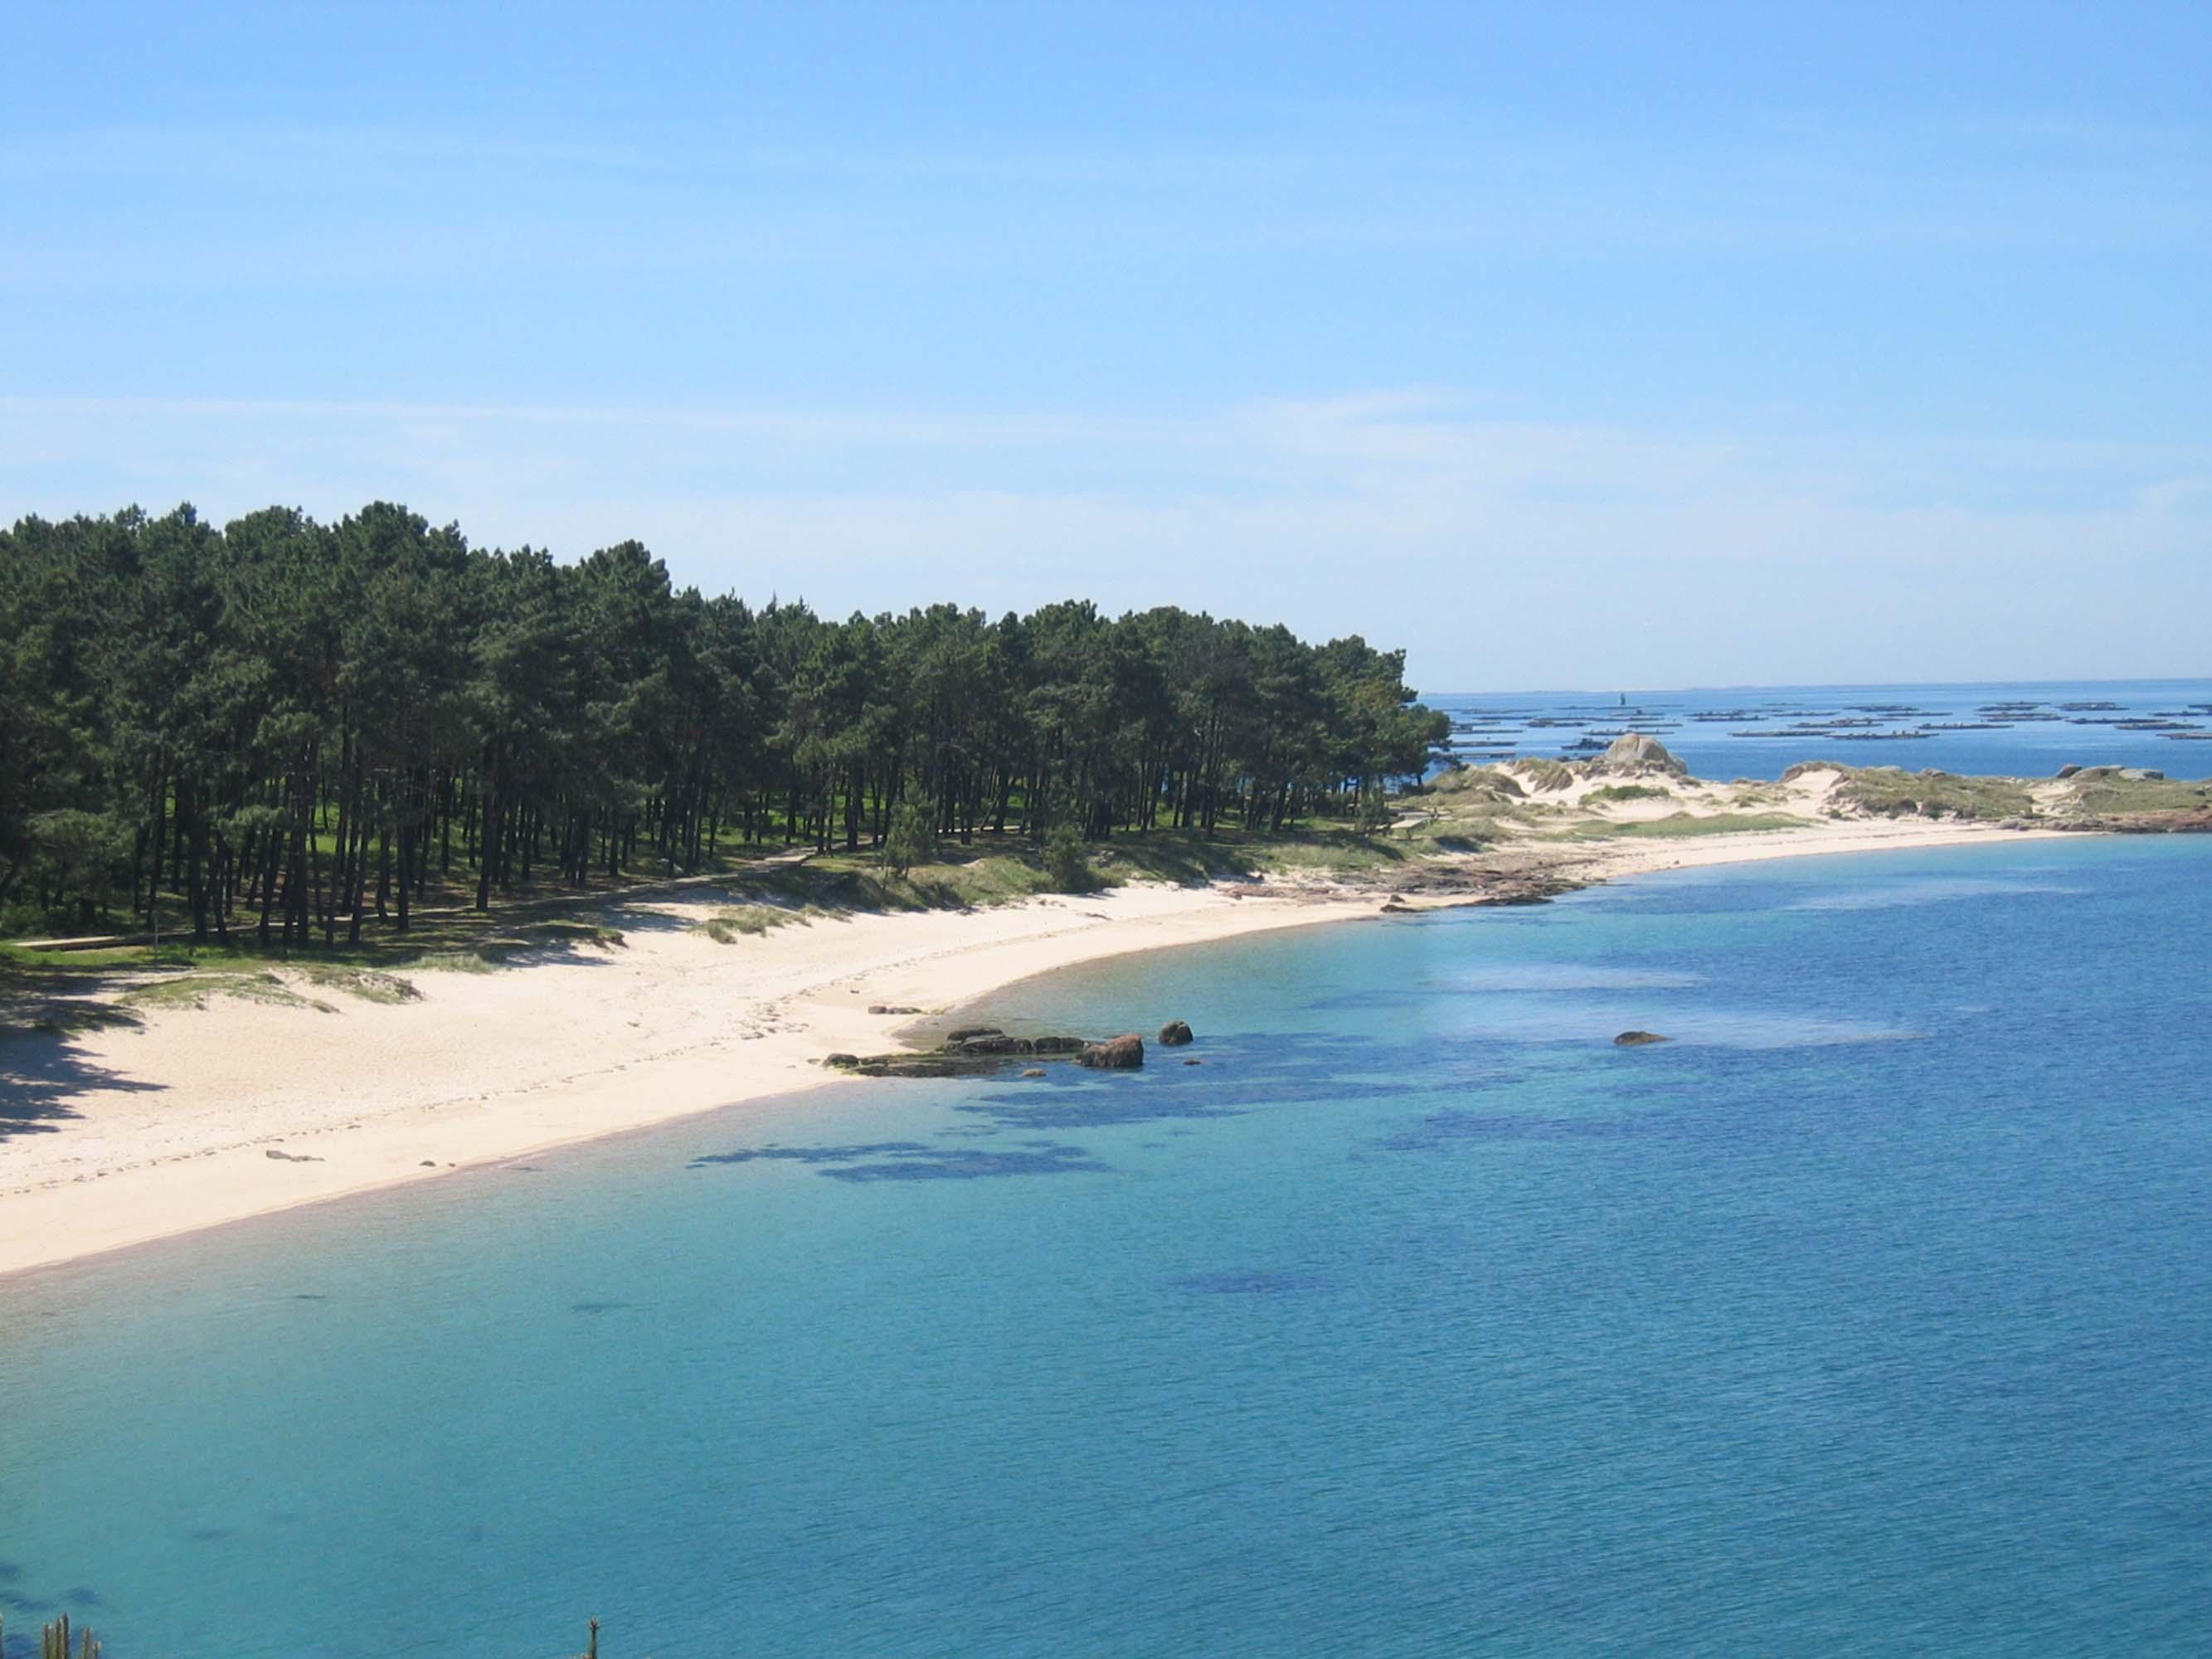 Playa area secada illa arousa. Fuente: Turismo Rías Baixas